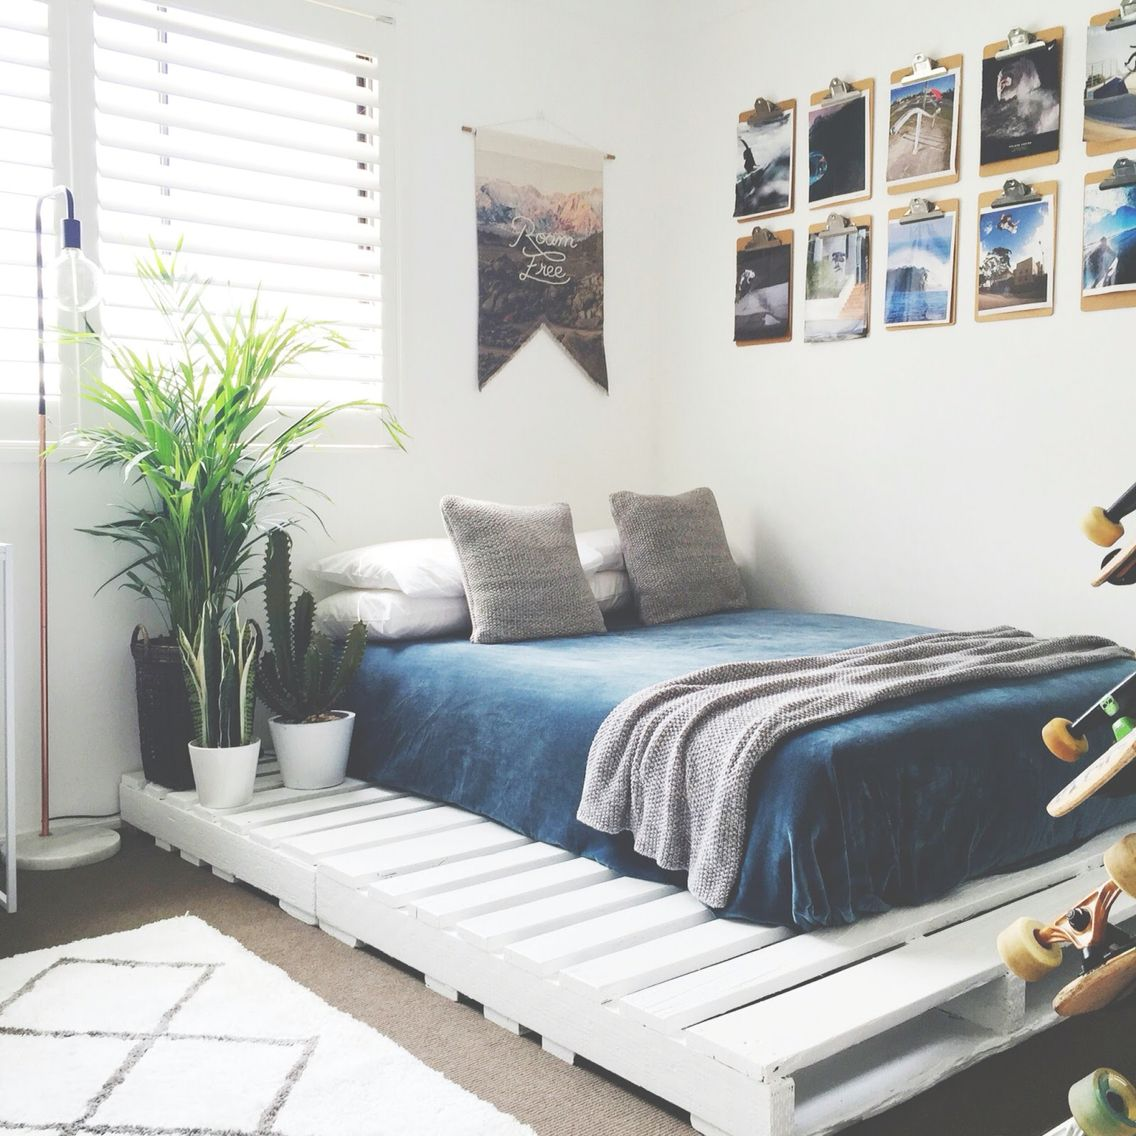 Diy pallet double bed - Pallet Bed